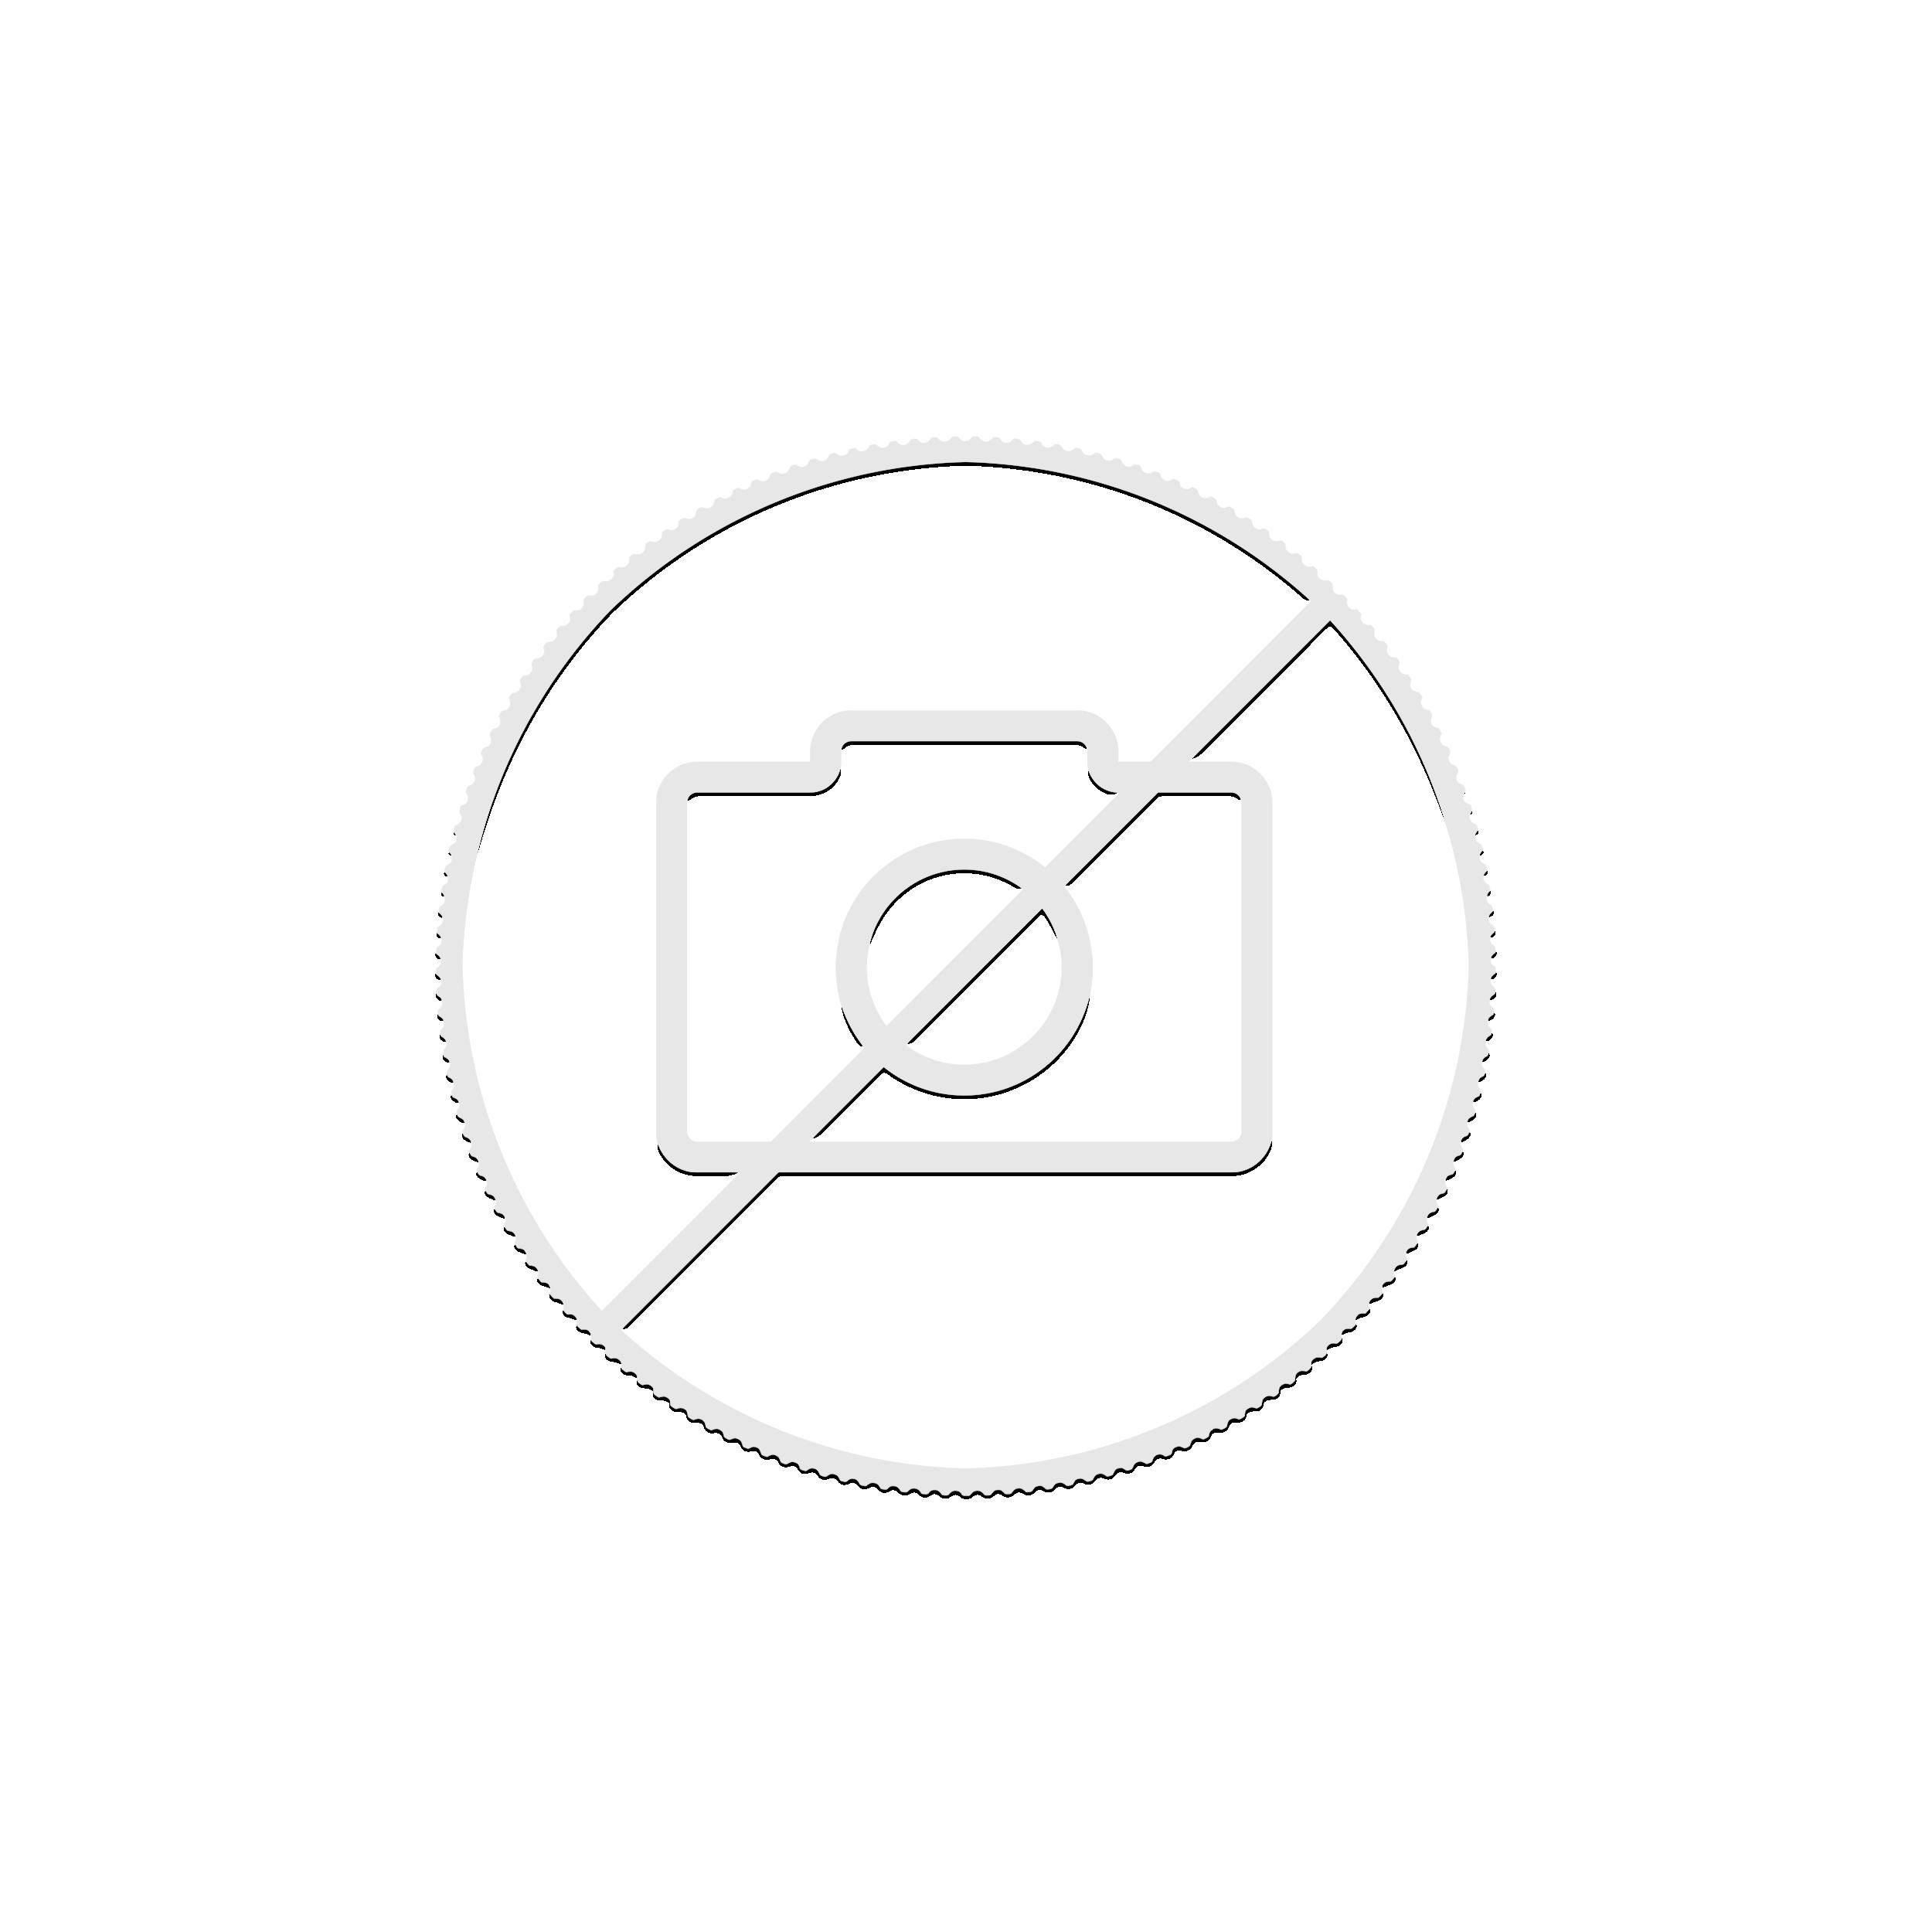 1 Kilo Koala zilver munt 2013